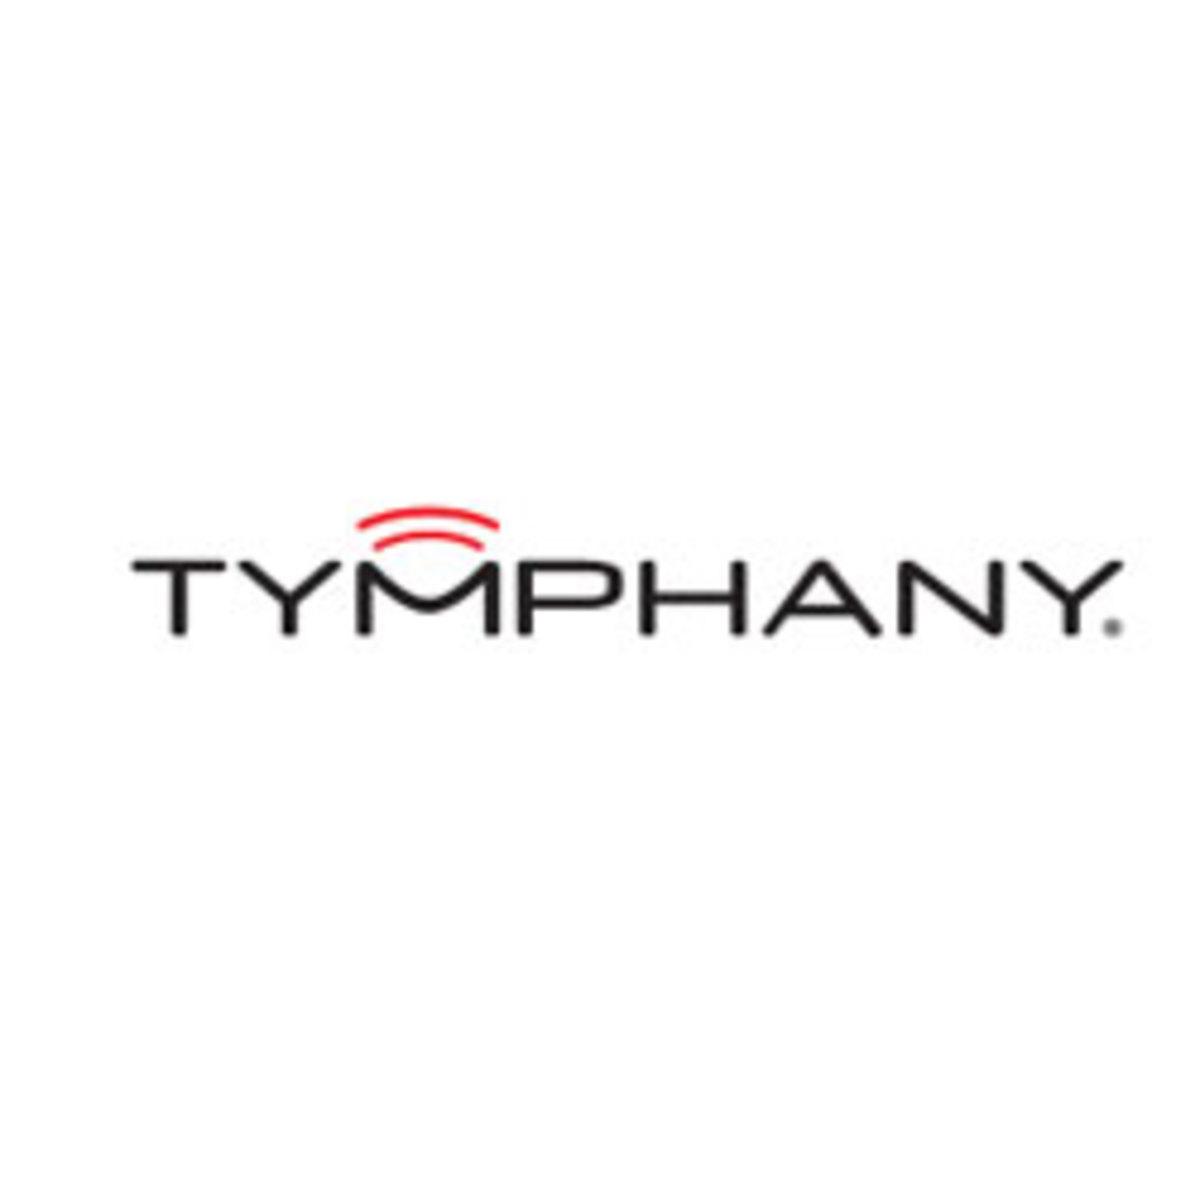 tymphany.jpg